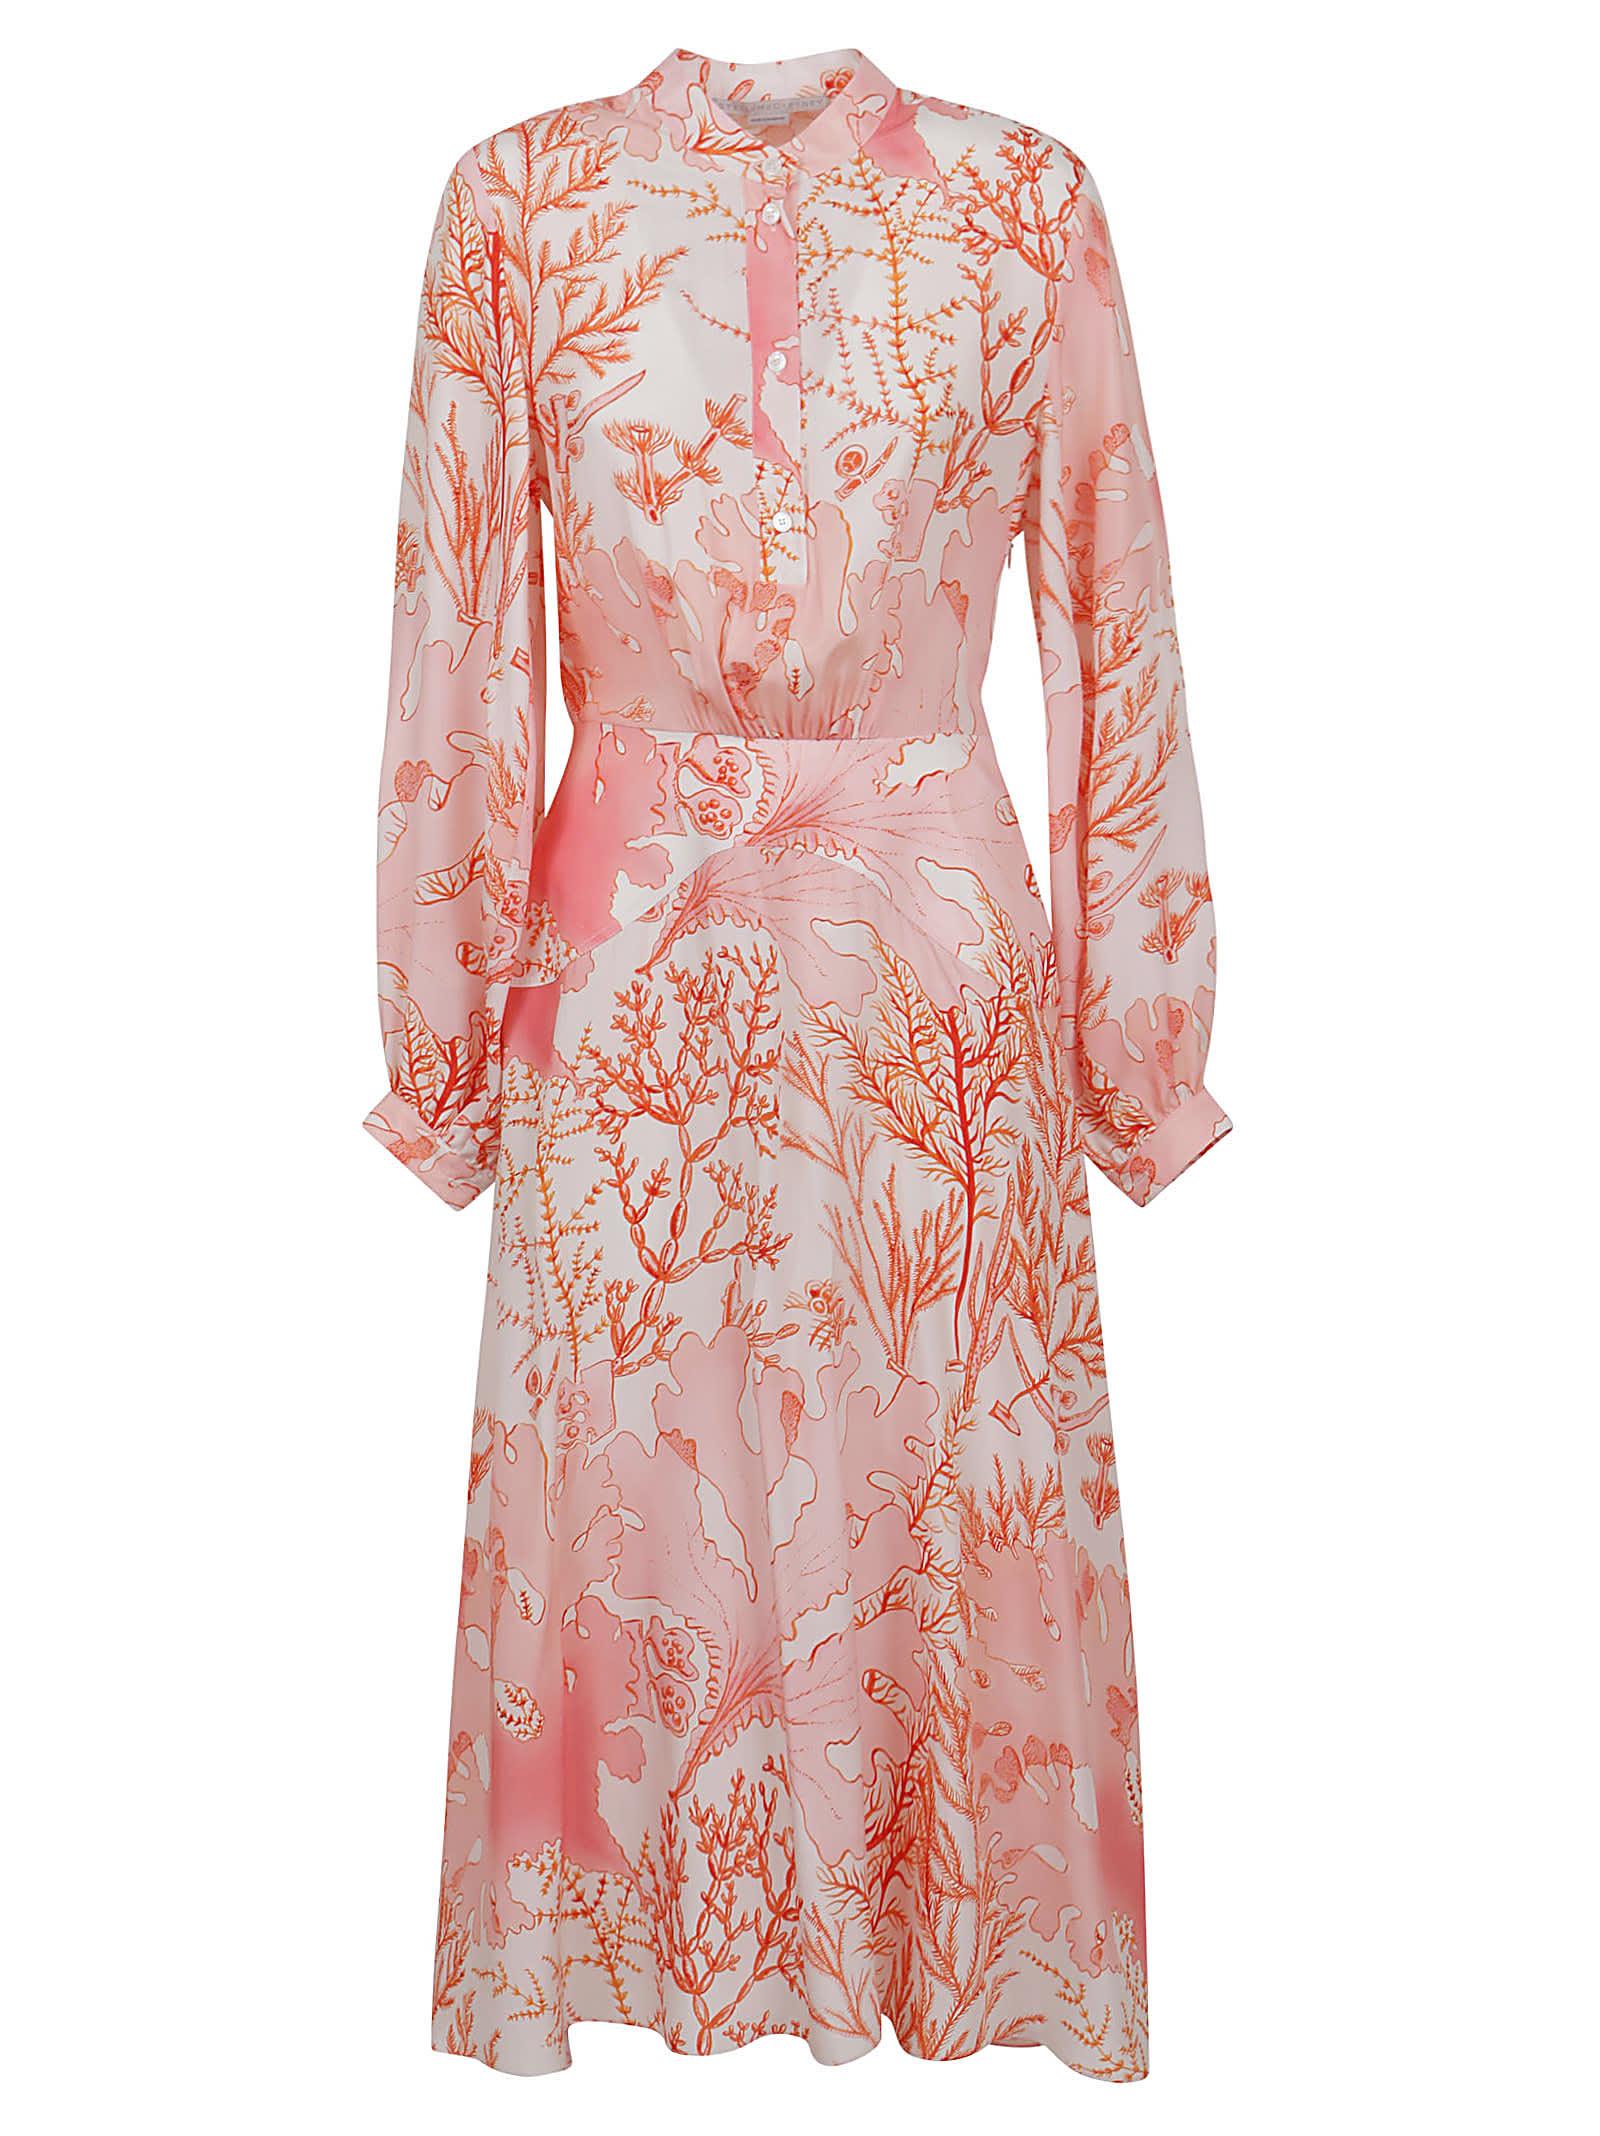 Stella Mccartney Clothing ALYSSA DRESS